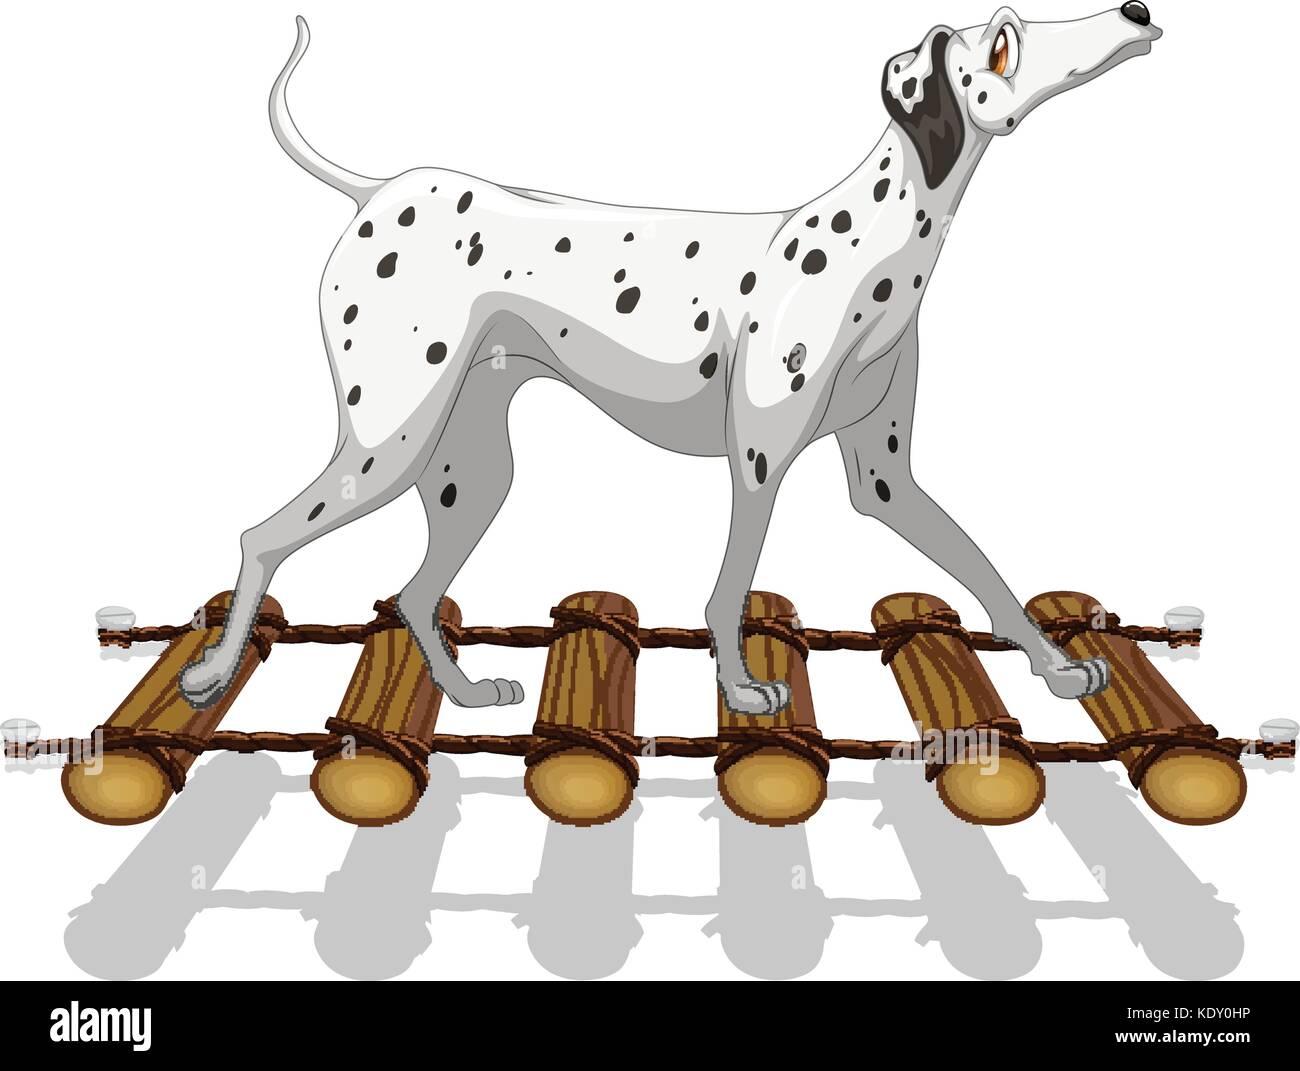 Dalmatian dog crossing the bridge illustration - Stock Vector